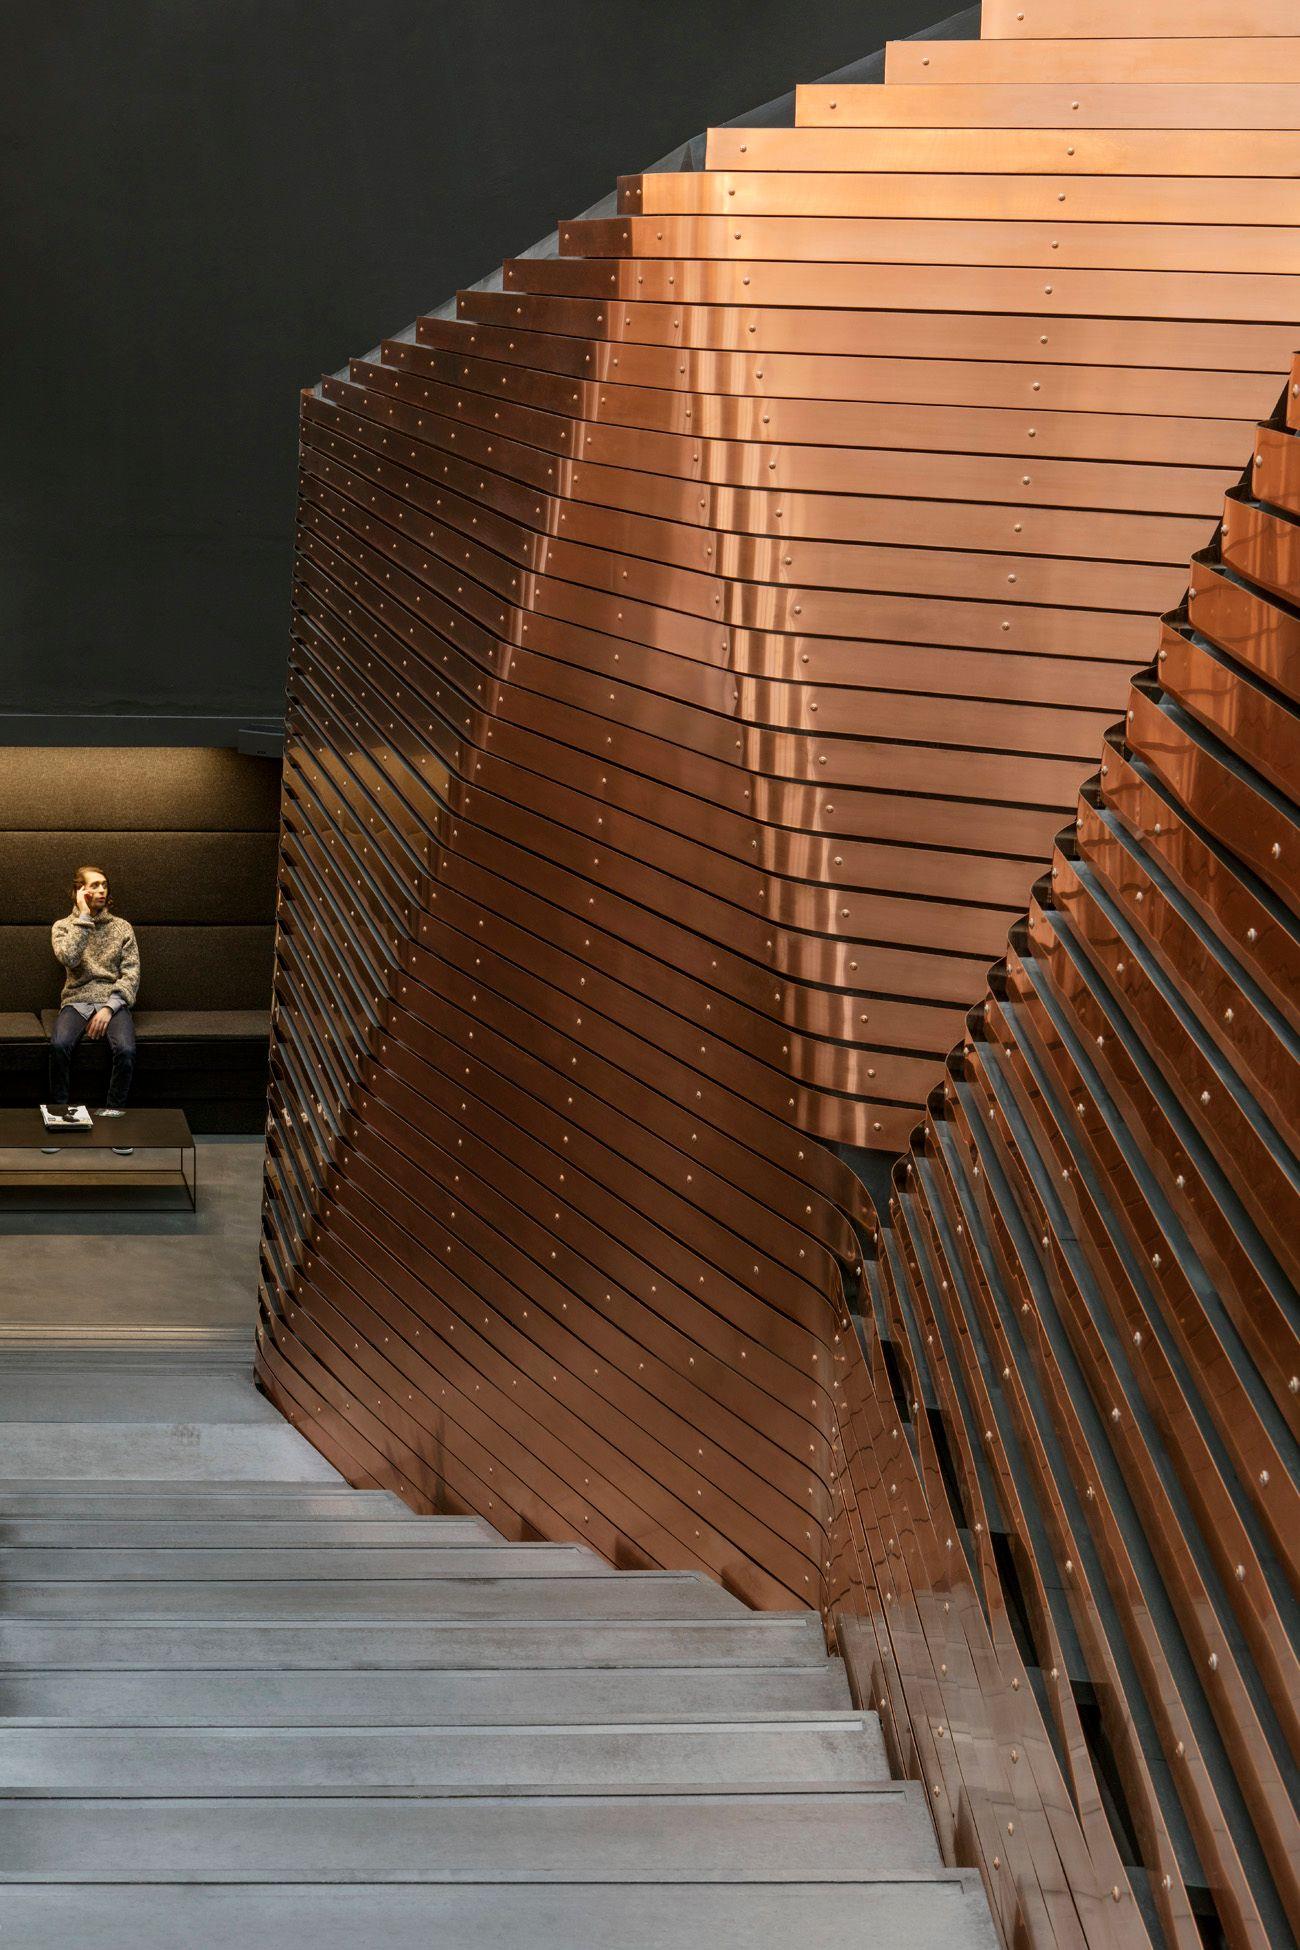 Red Bull studio copper cladding c Jan Bitter compressed - Le cuivre sublime des bâtiments insolites